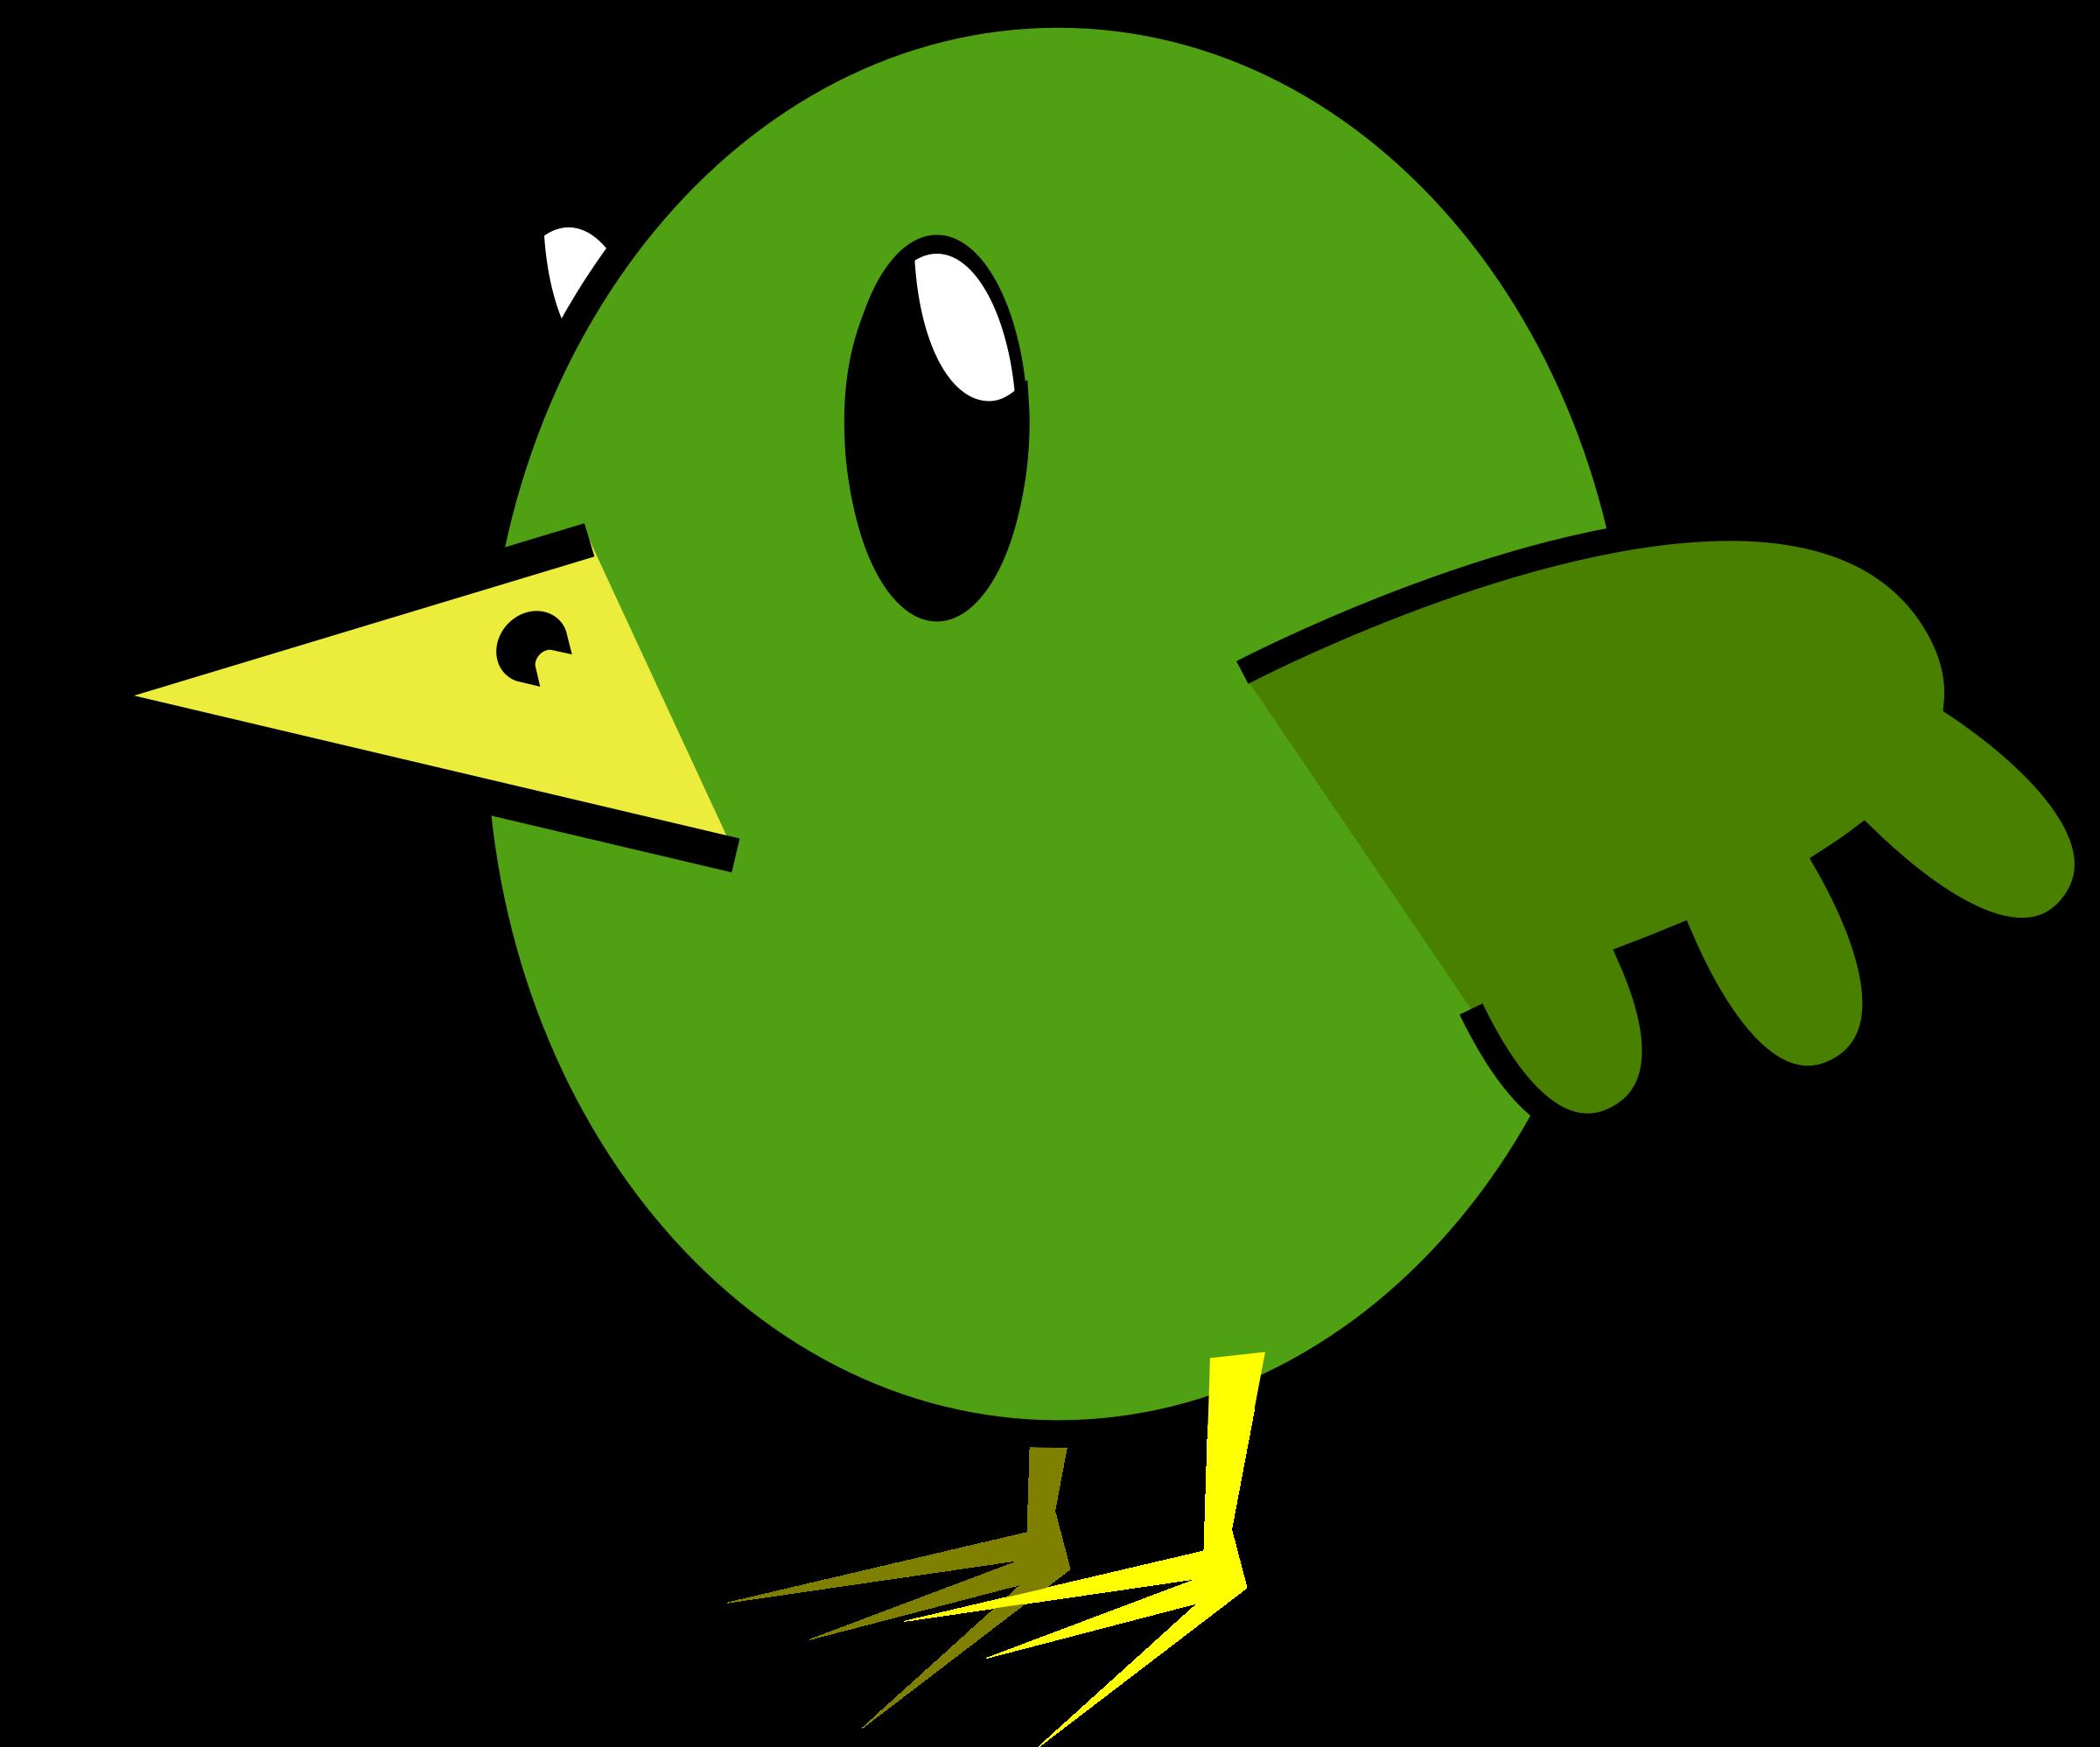 Ducks clipart green. Boid big image png